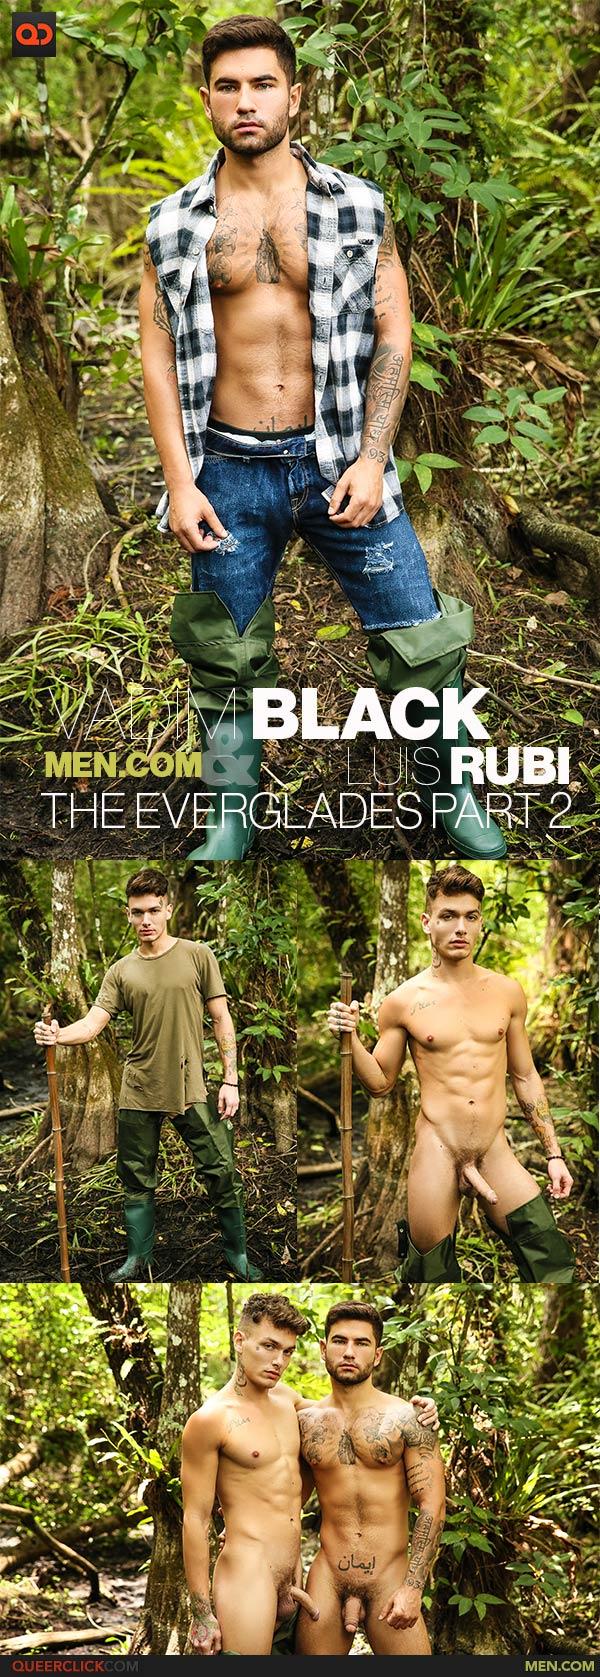 Men.com: Vadim Black and Luis Rubi